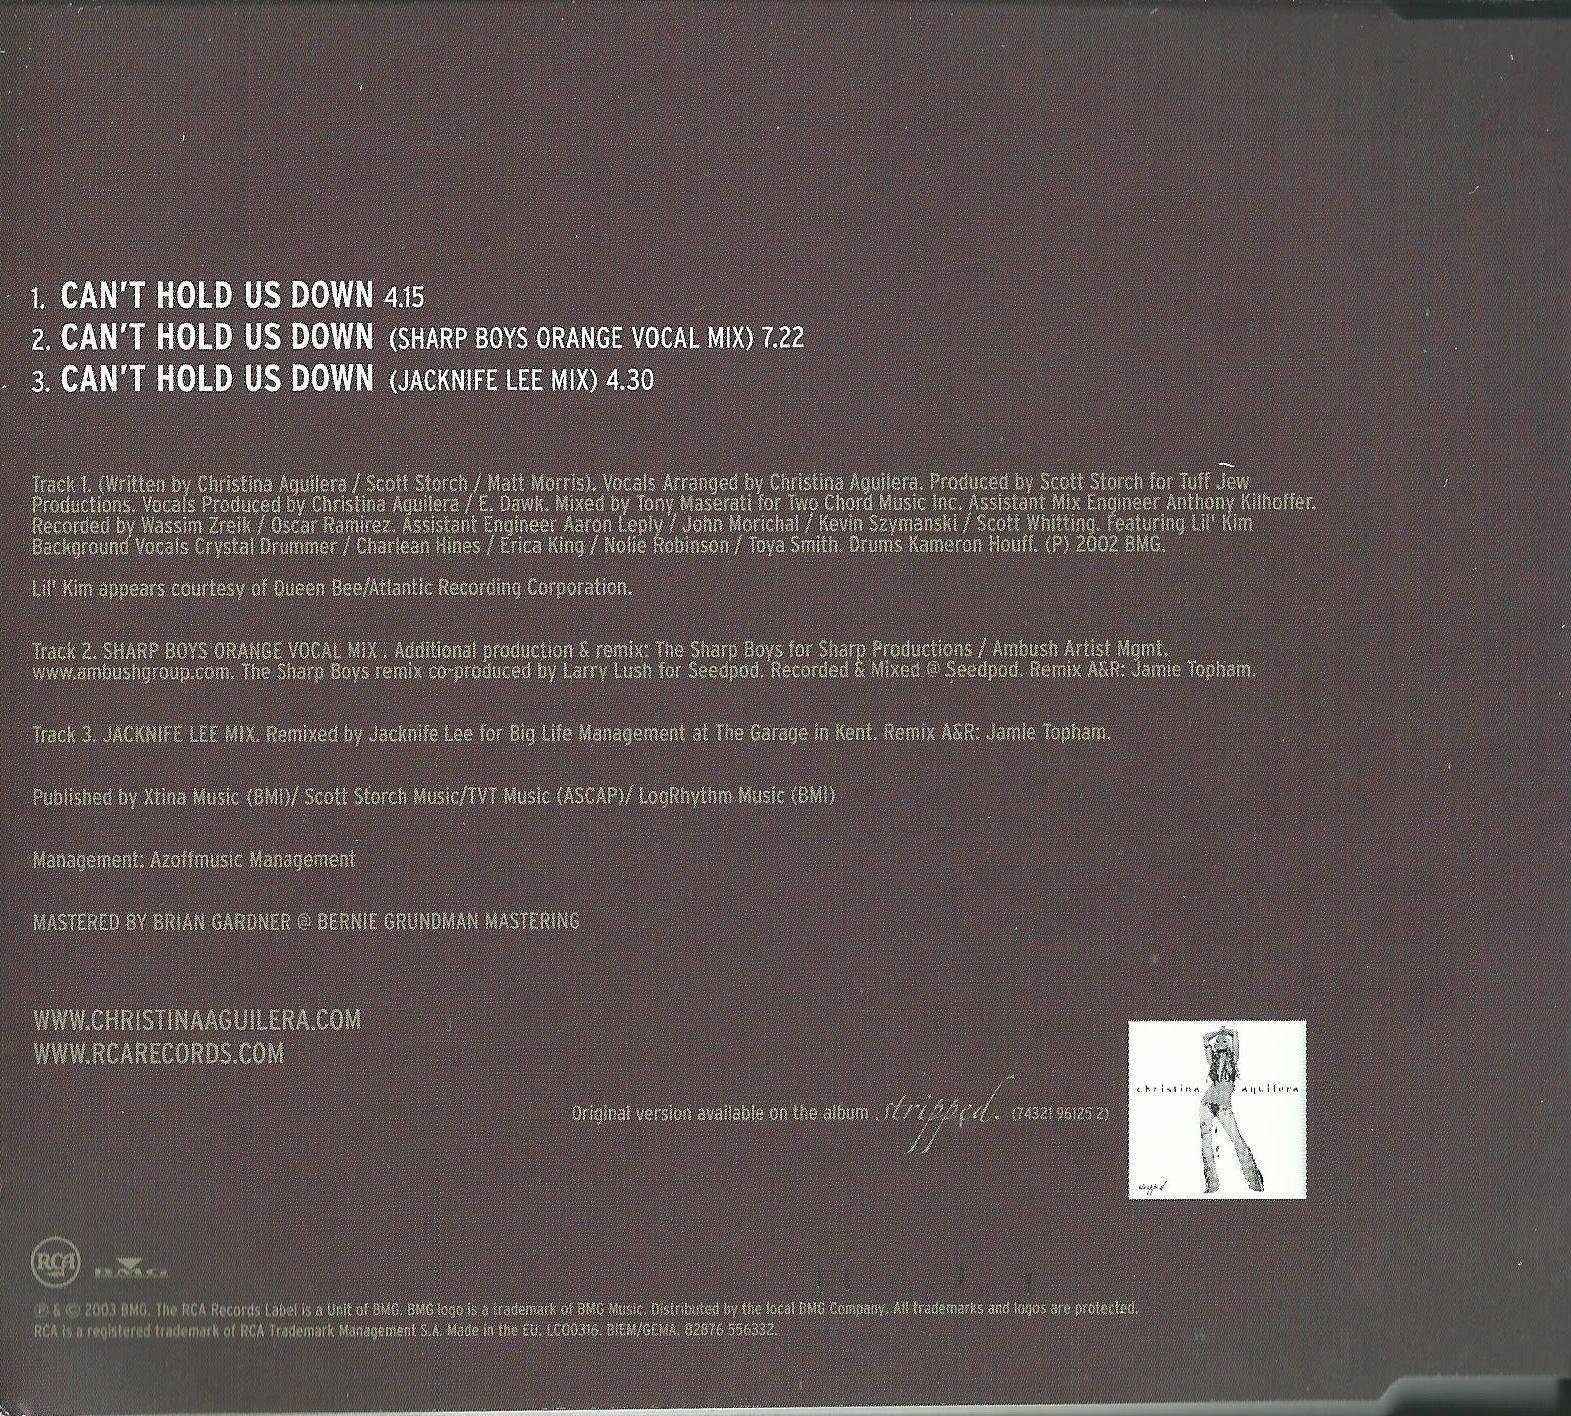 CHRISTINA AGUILERA FEATURING LIL' KIM - CAN'T HOLD US DOWN 2003 EU CD SINGLE